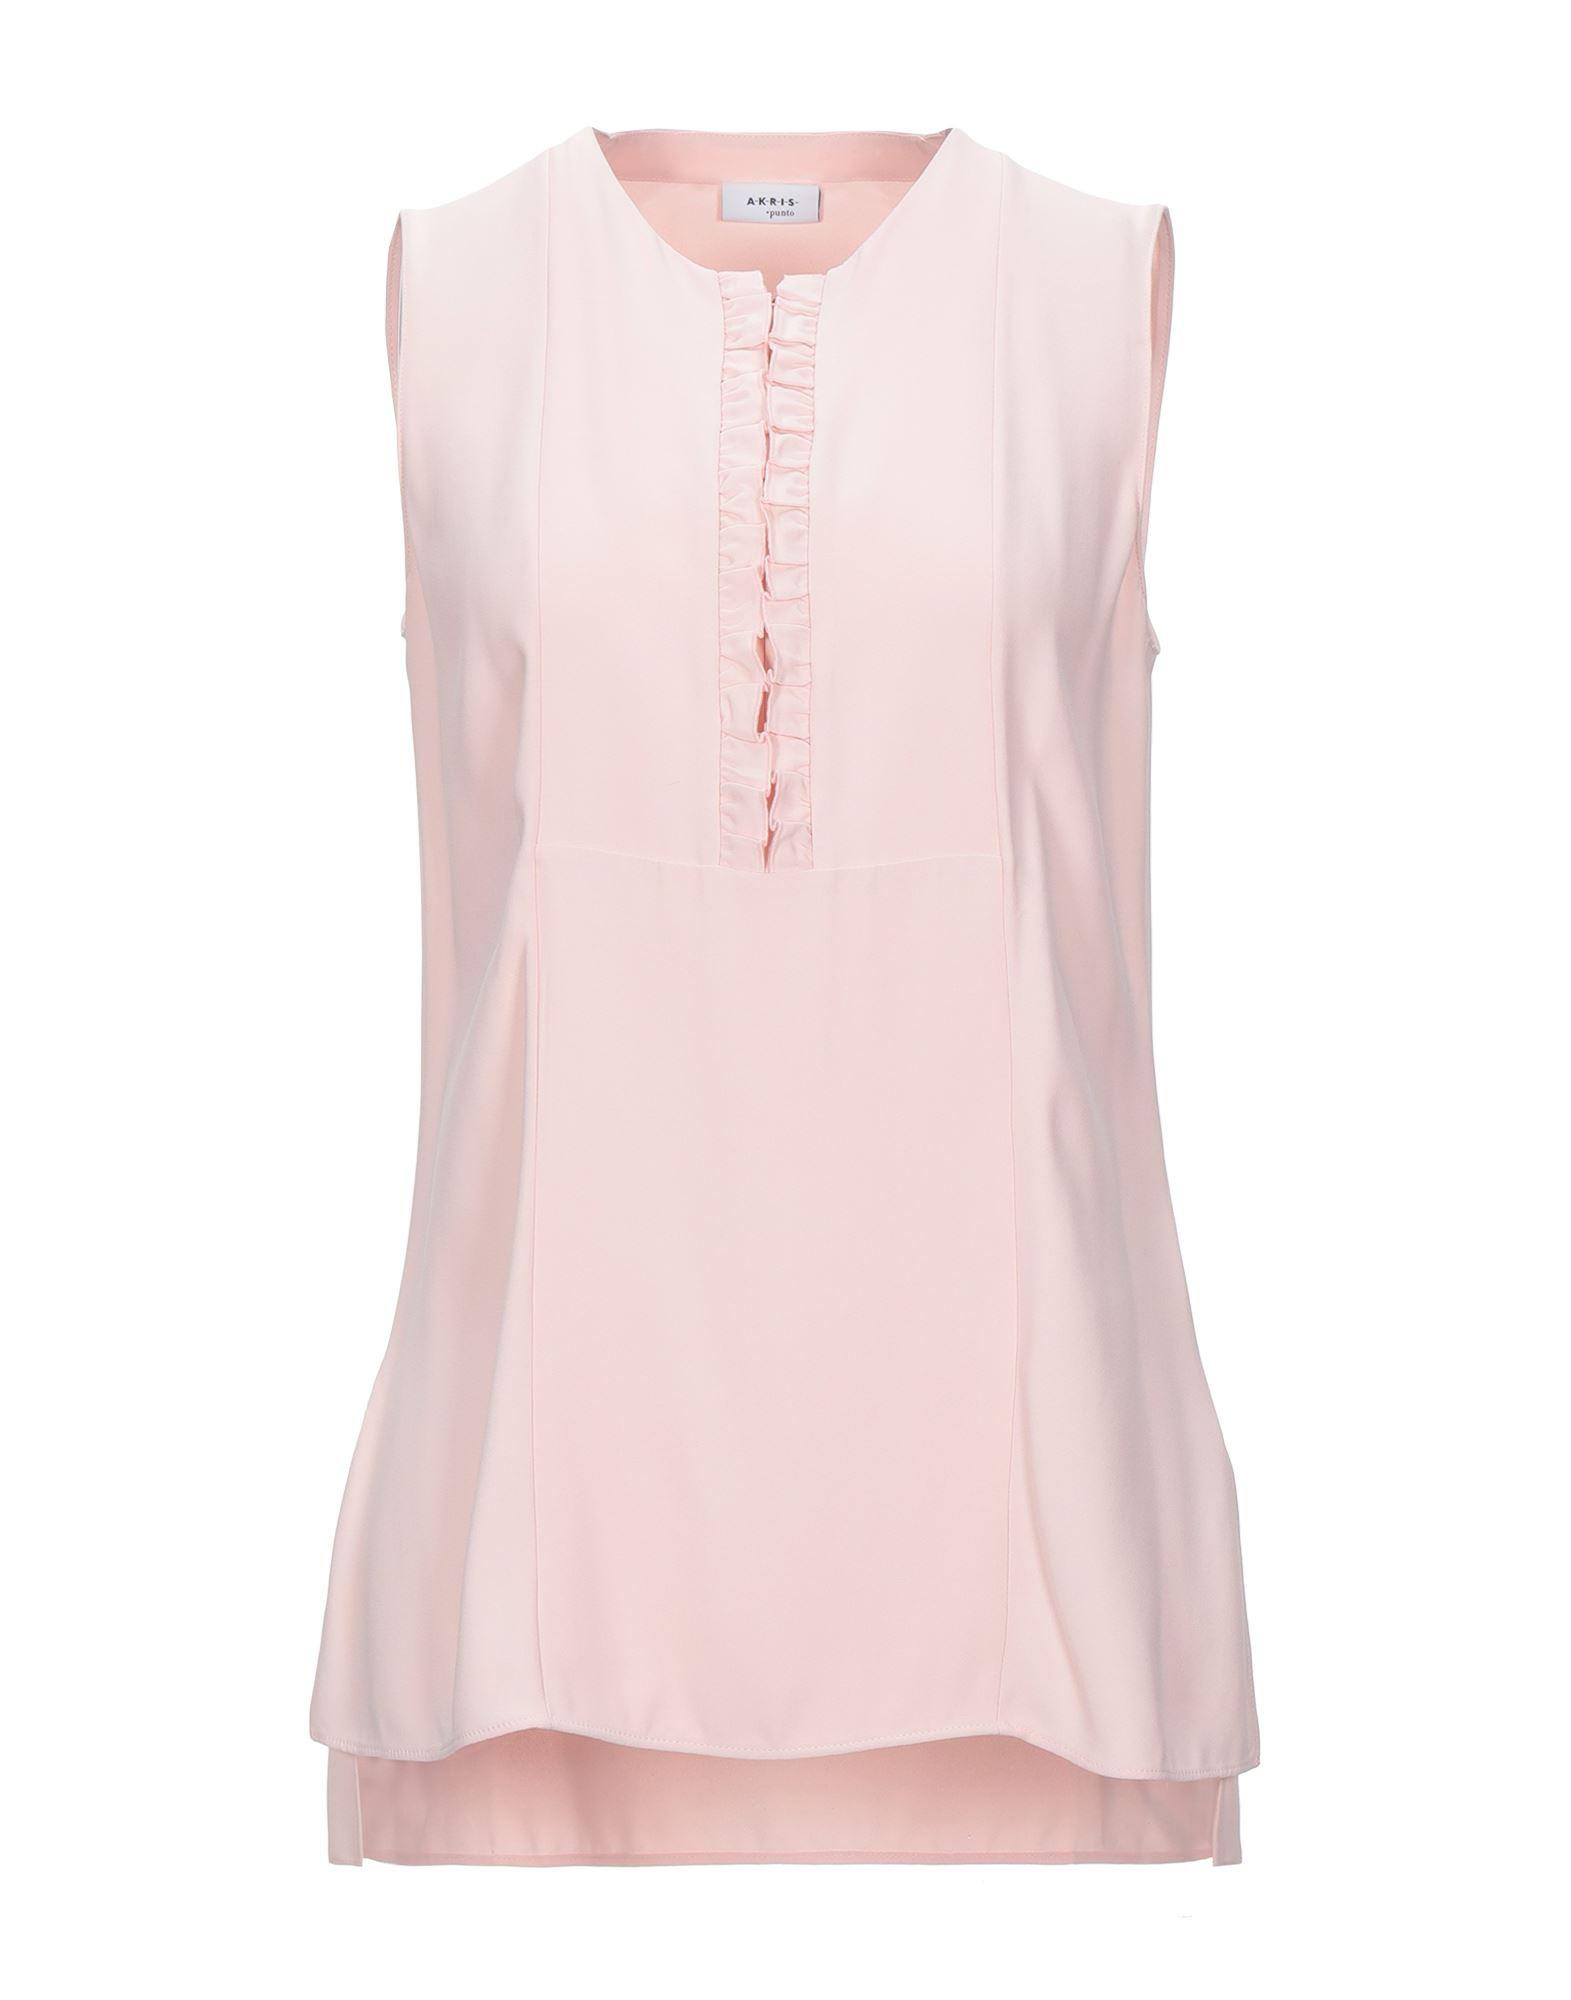 AKRIS PUNTO Tops. plain weave, ruffles, basic solid color, round collar, sleeveless, front closure, zipper closure. 52% Viscose, 48% Acetate